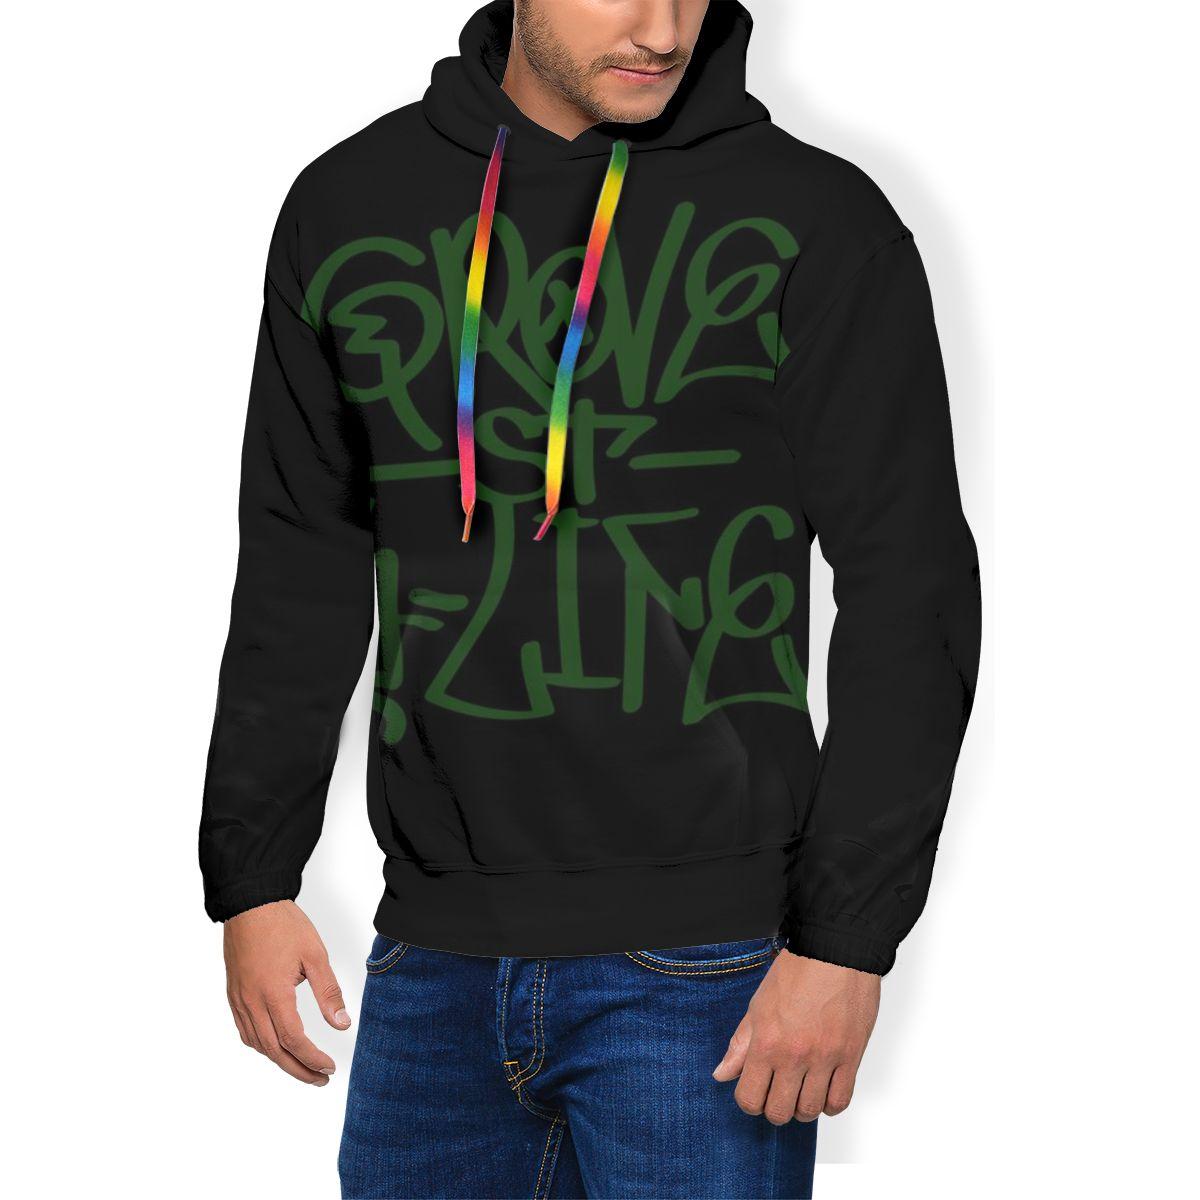 Gta San Andreas Capuche Gta San Andreas Hoodies Streetwear Long pull à capuche Automne Polyester XXL Sweat À Capuche